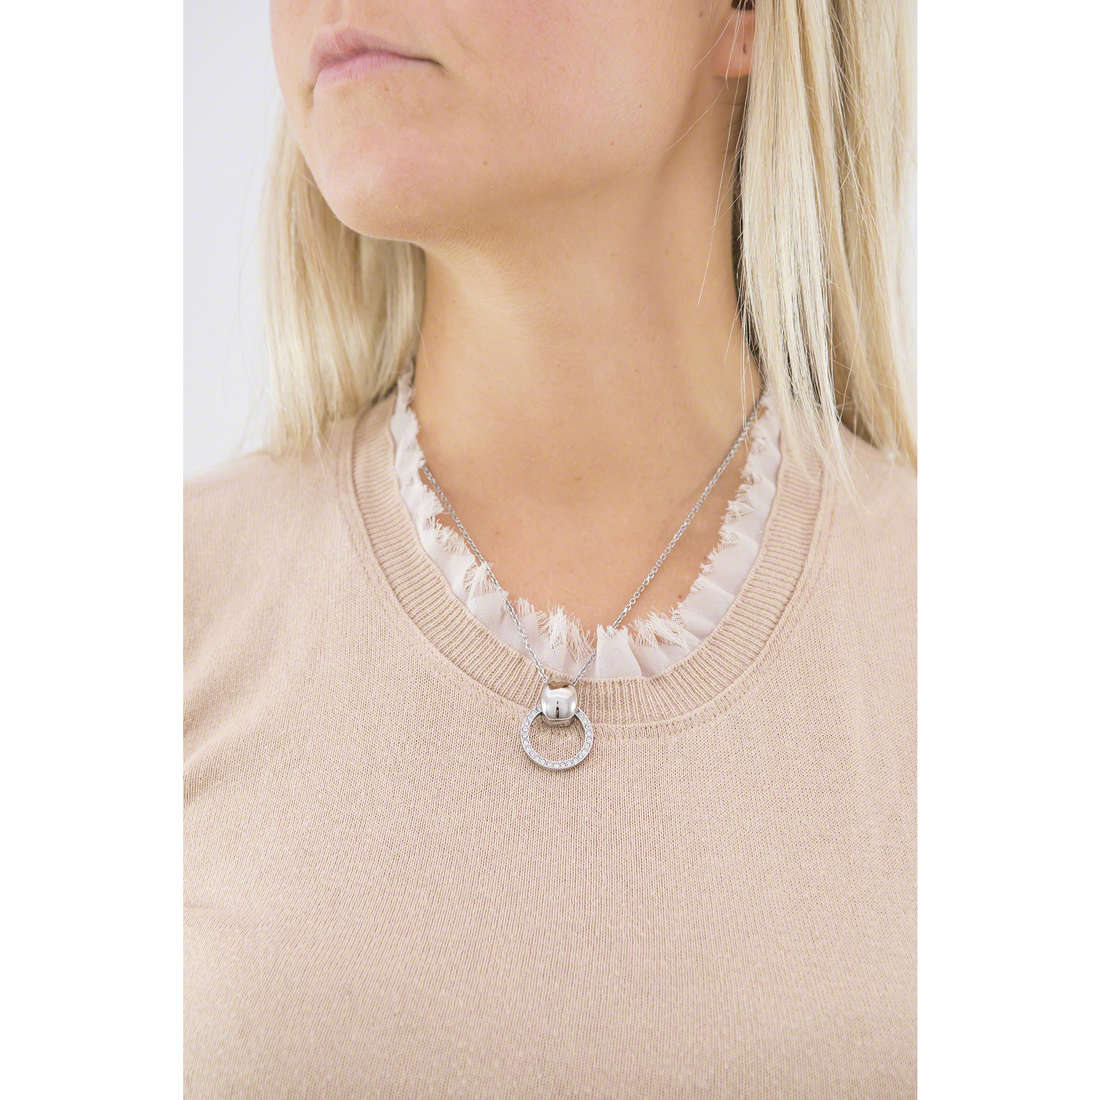 Breil collane Breilogy donna TJ1684 indosso